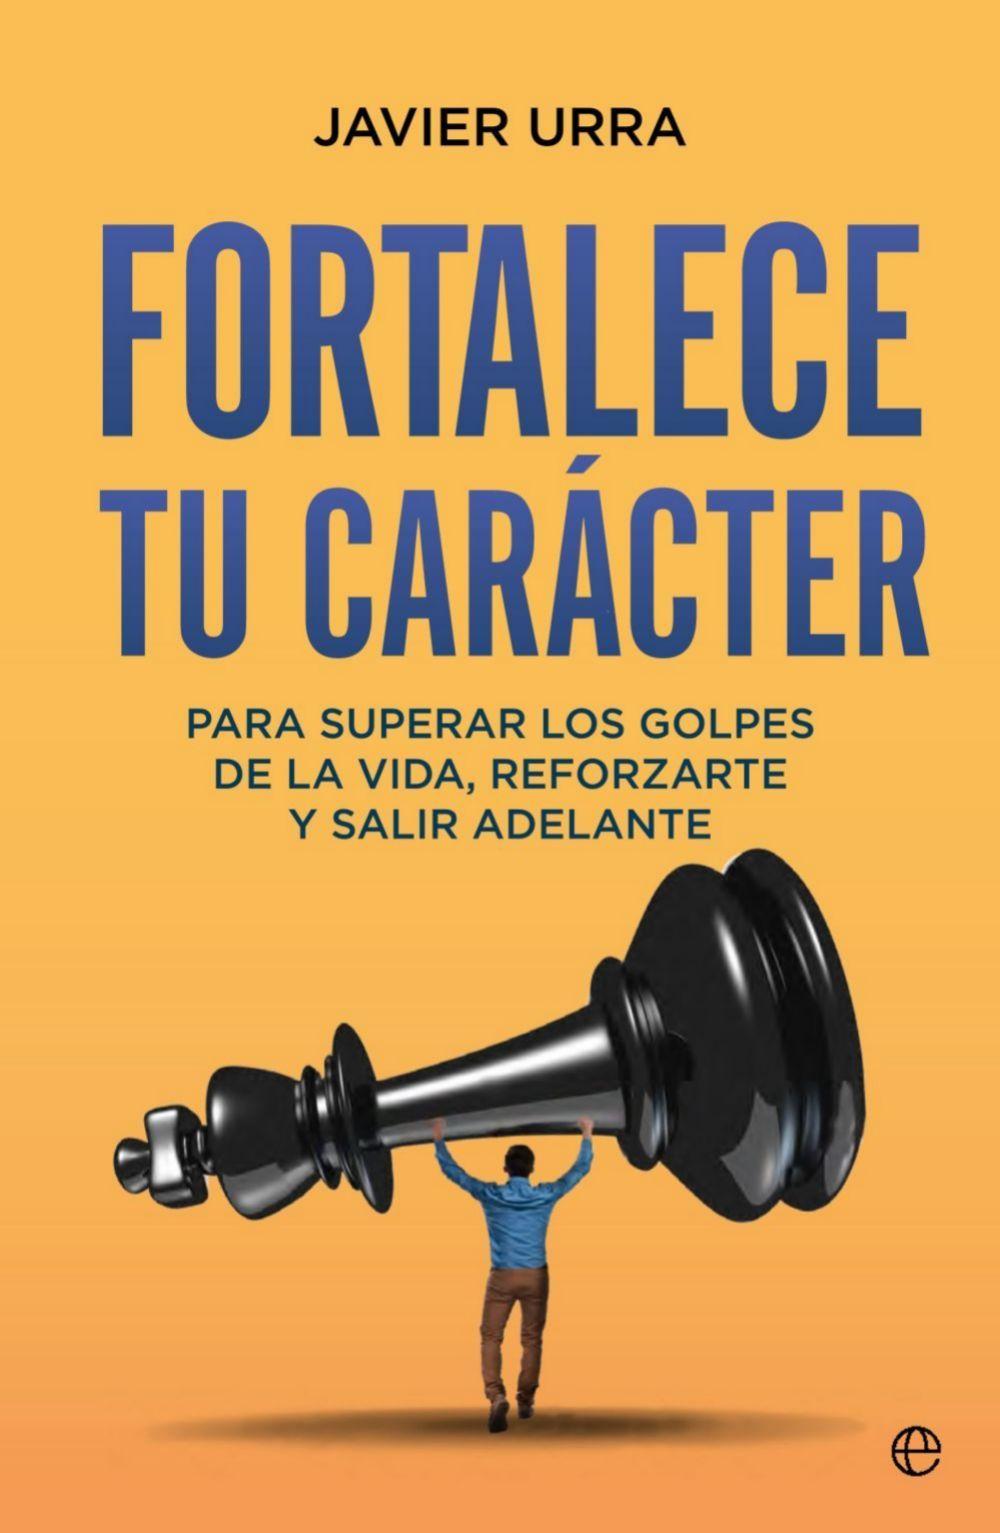 Fortalece tu carácter, Javier Urra. La Esfera (17,90 euros).